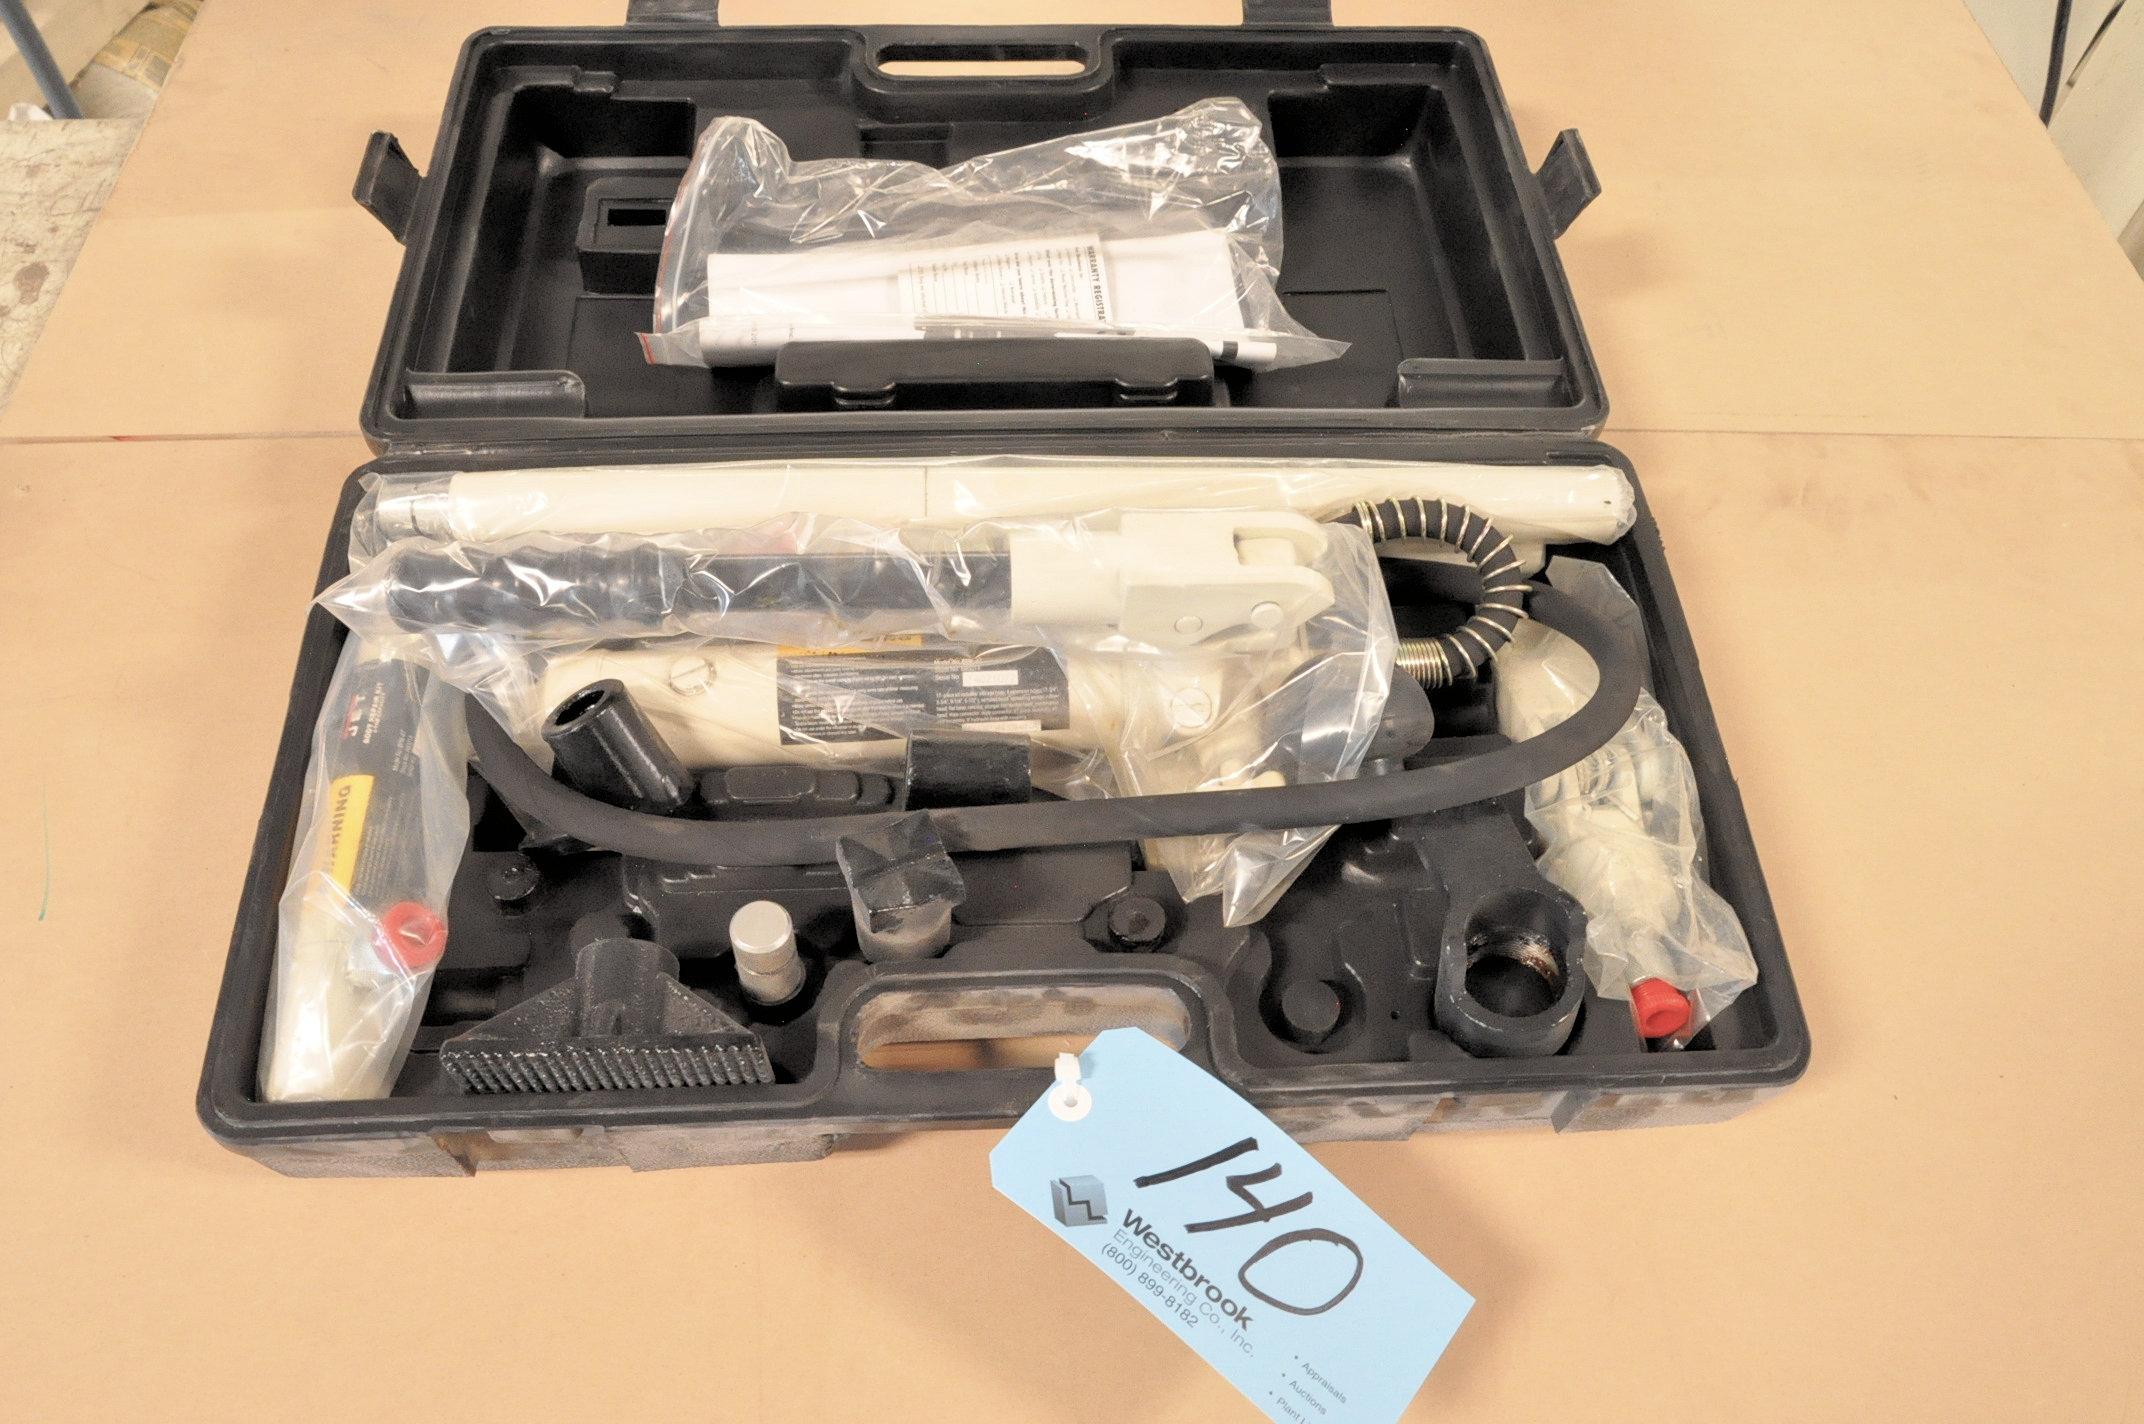 Jet BRK-4T, Hydraulic 4-Ton Body Repair Kit